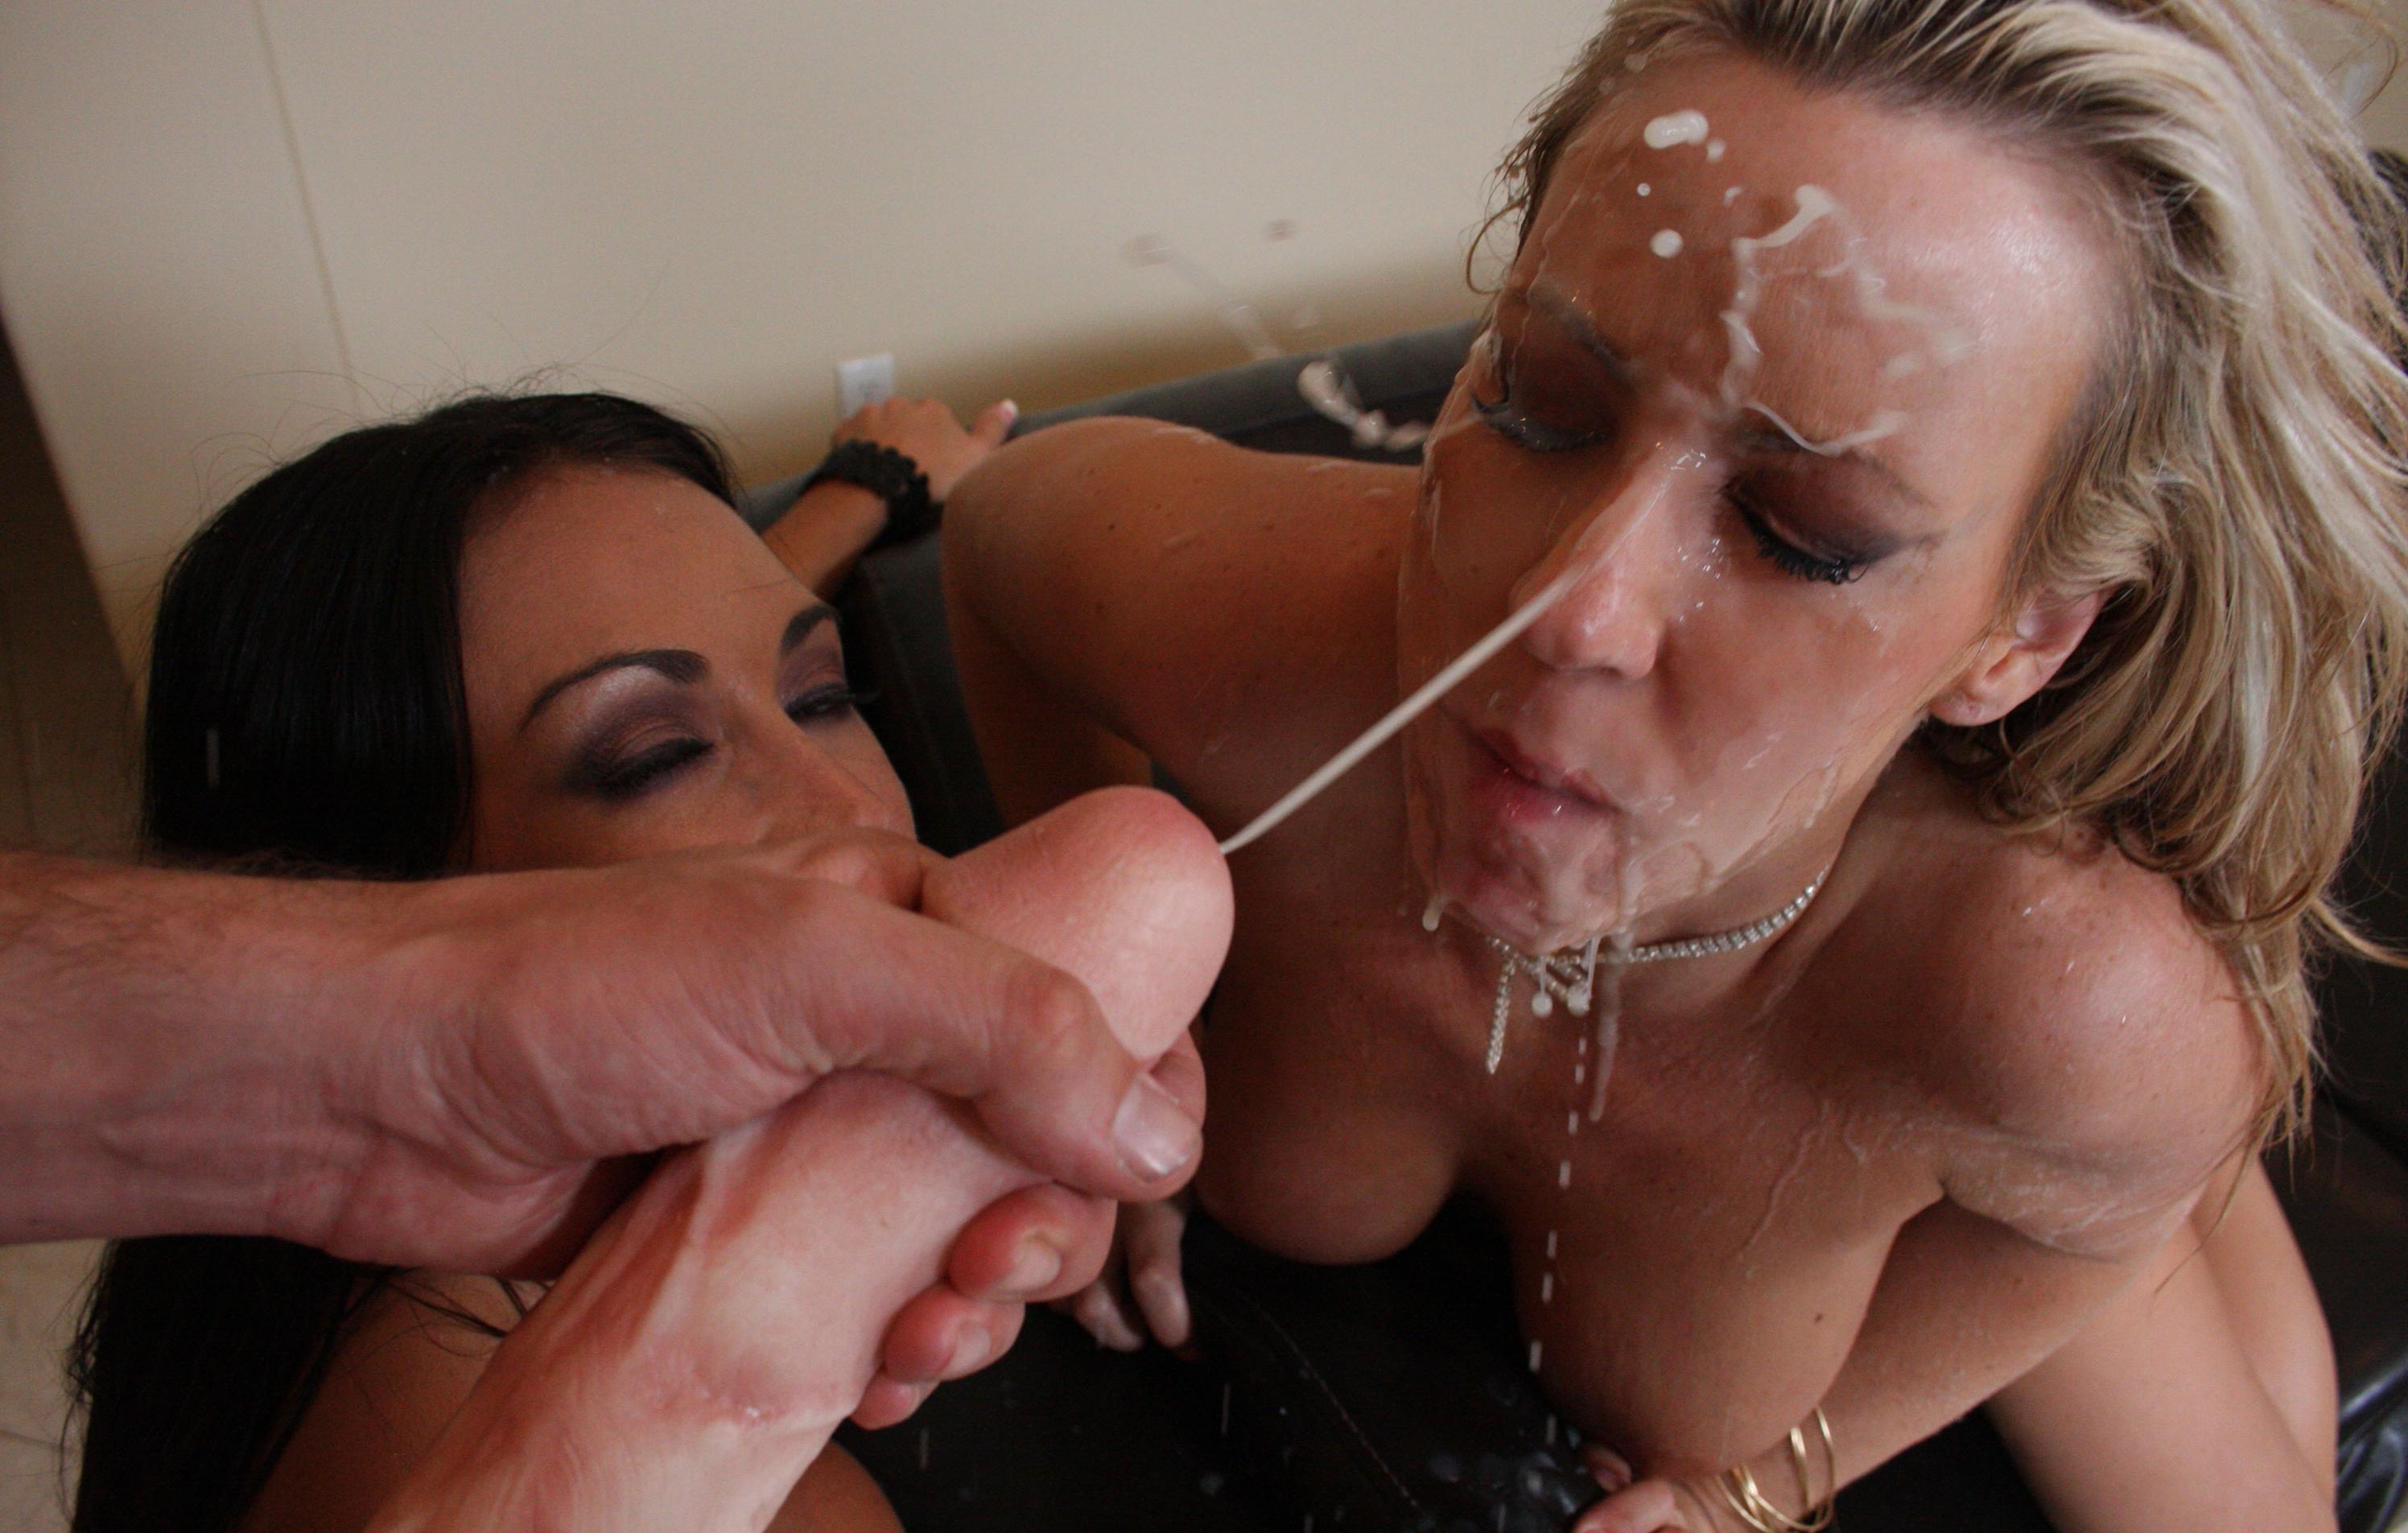 Wallpaper Carolyn Reese Girlfriend Milf 2 Babes Pornactress